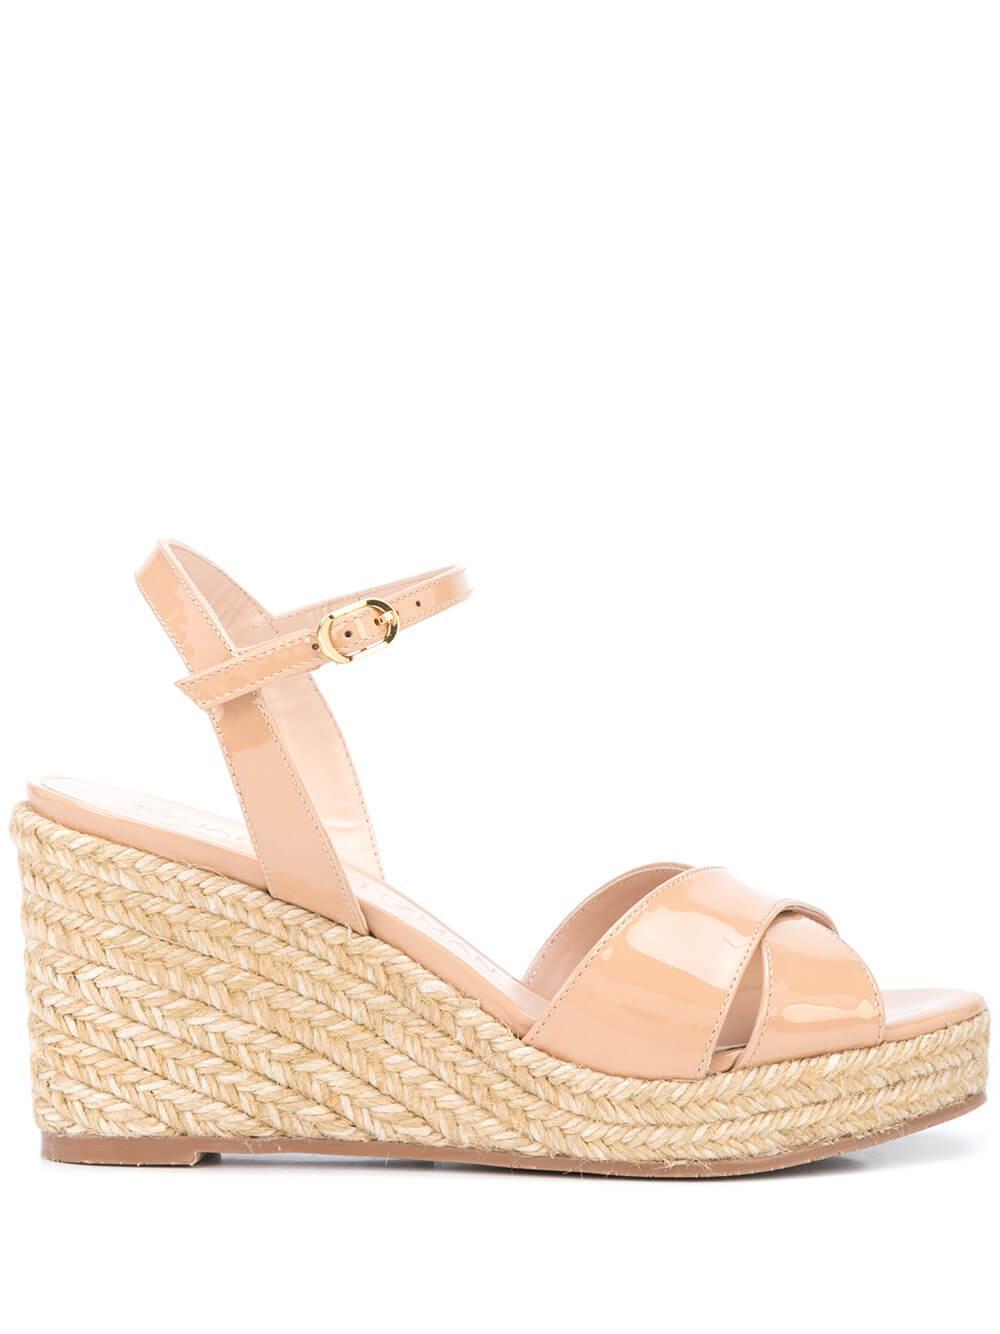 Patent 75mm Wedge Platform Sandal Item # ROSEMARIE